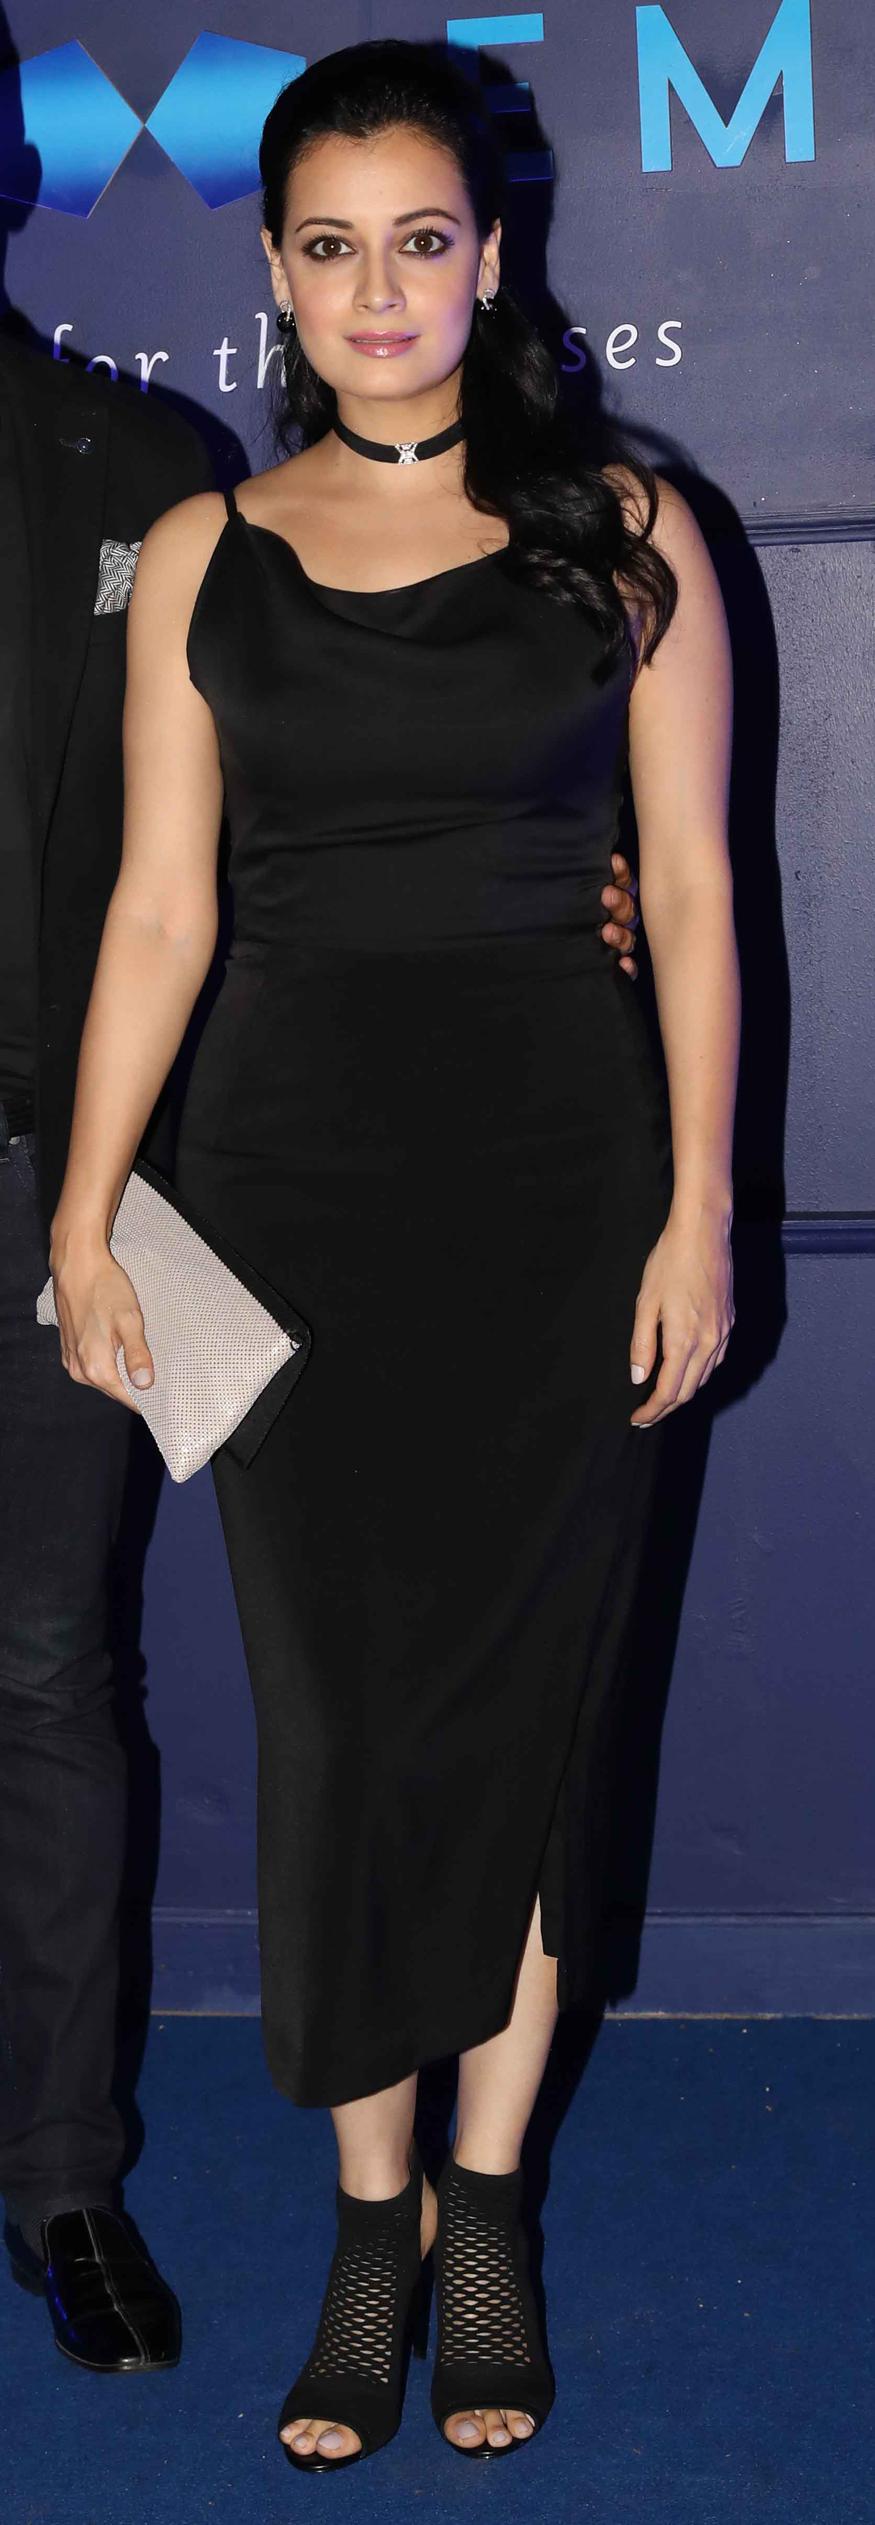 Worst Dressed Celebrities Of 2013: Pics - Boldsky.com